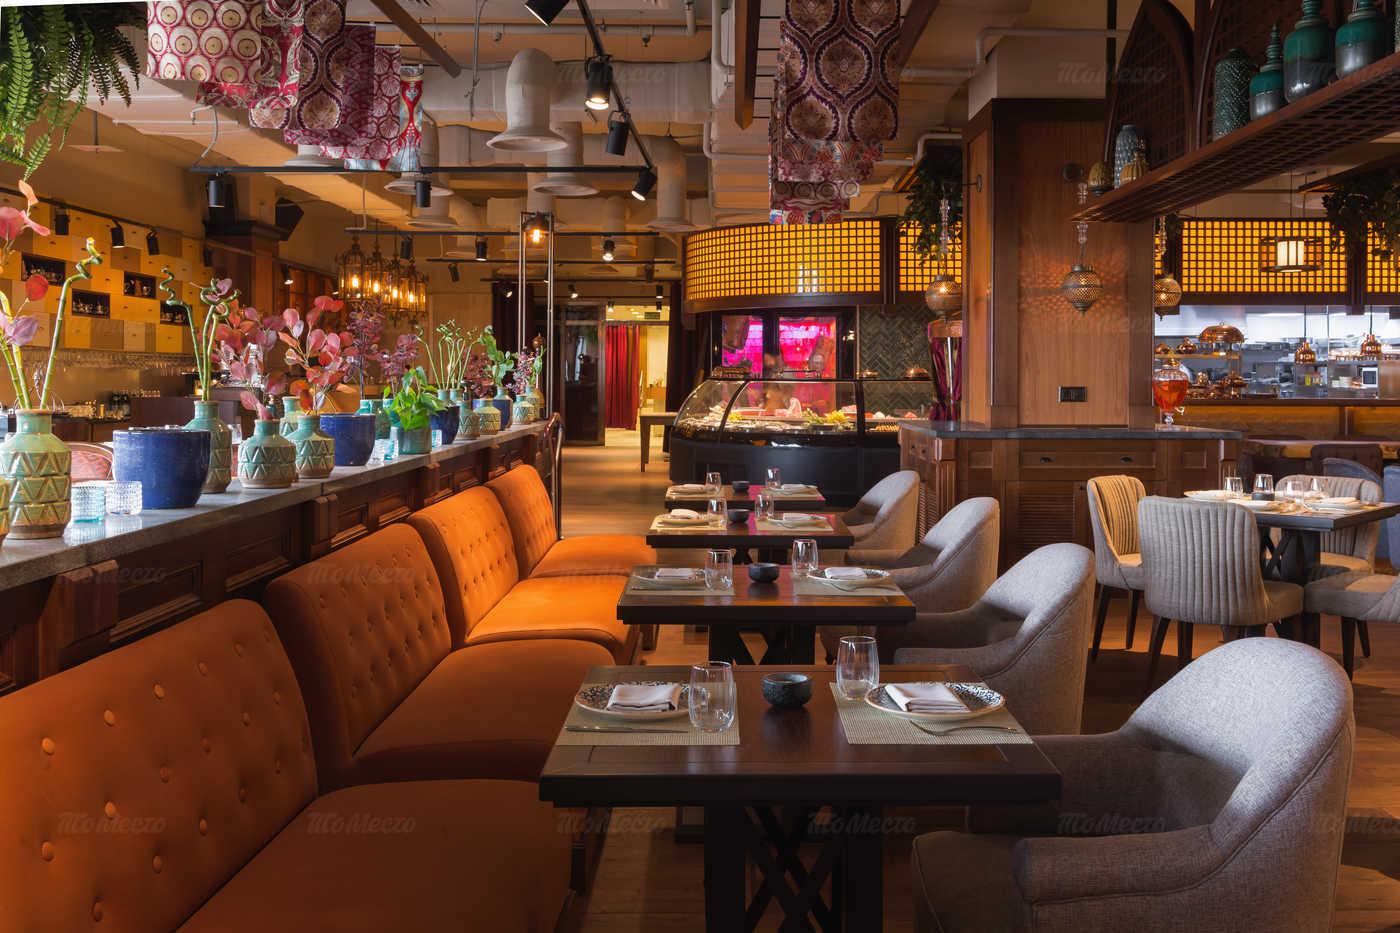 Ресторан Левантин (Levantine) на Новинском бульваре фото 26